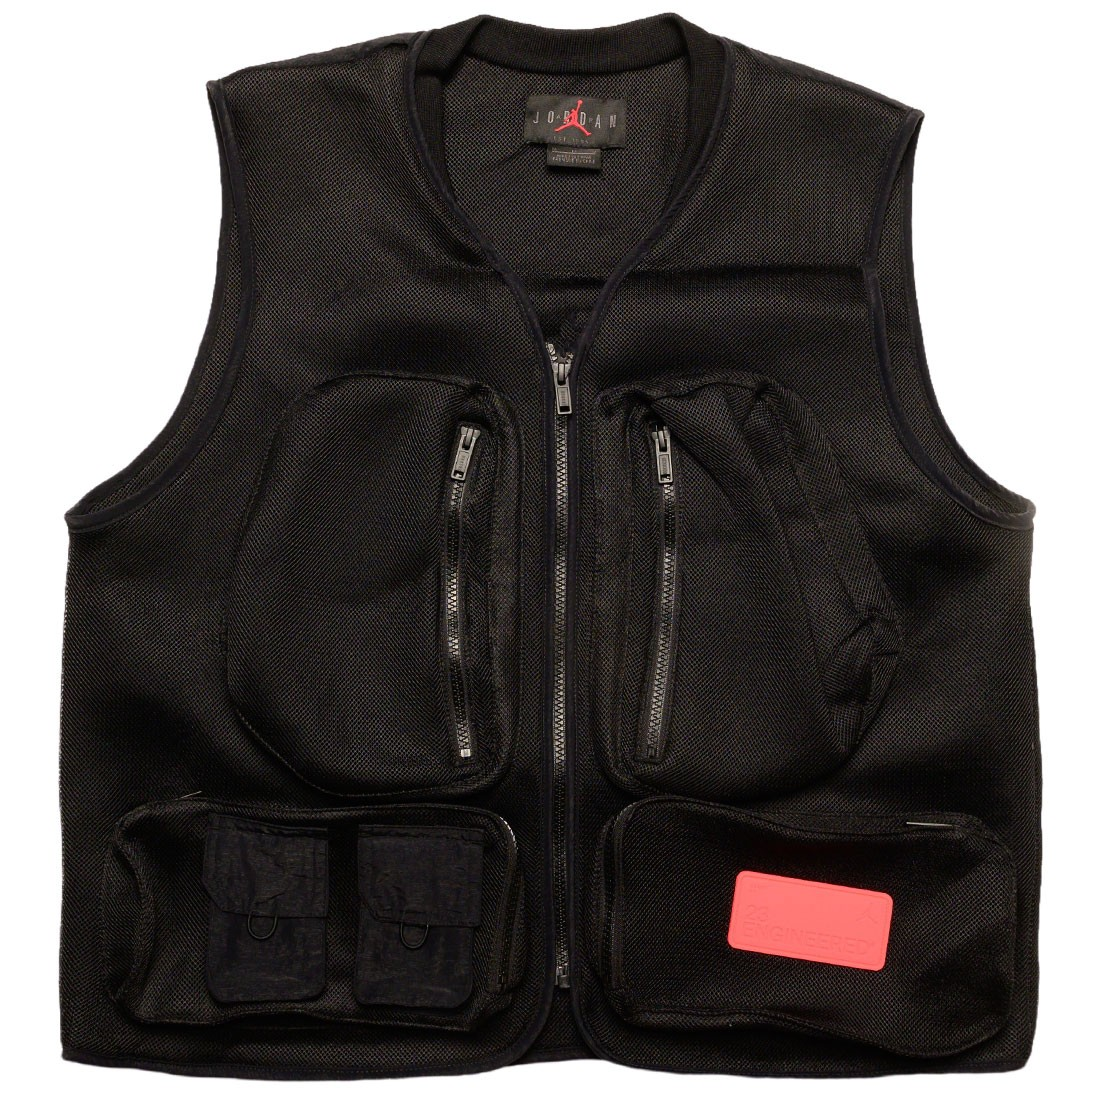 Jordan Men 23 Engineered Vest (black / infrared 23)